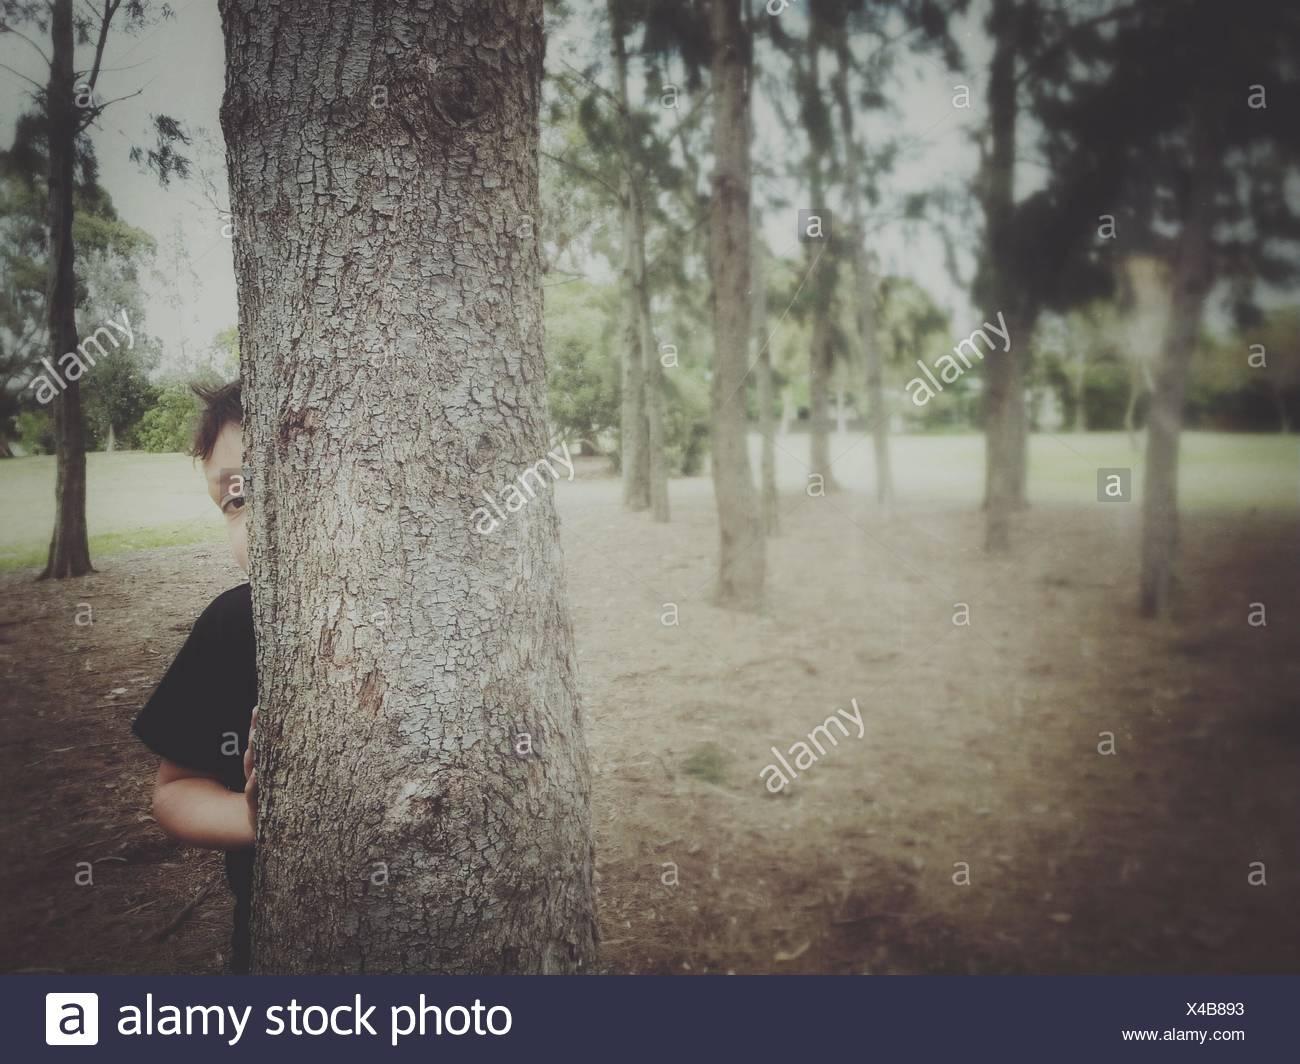 Boy Hiding behind a tree Photo Stock